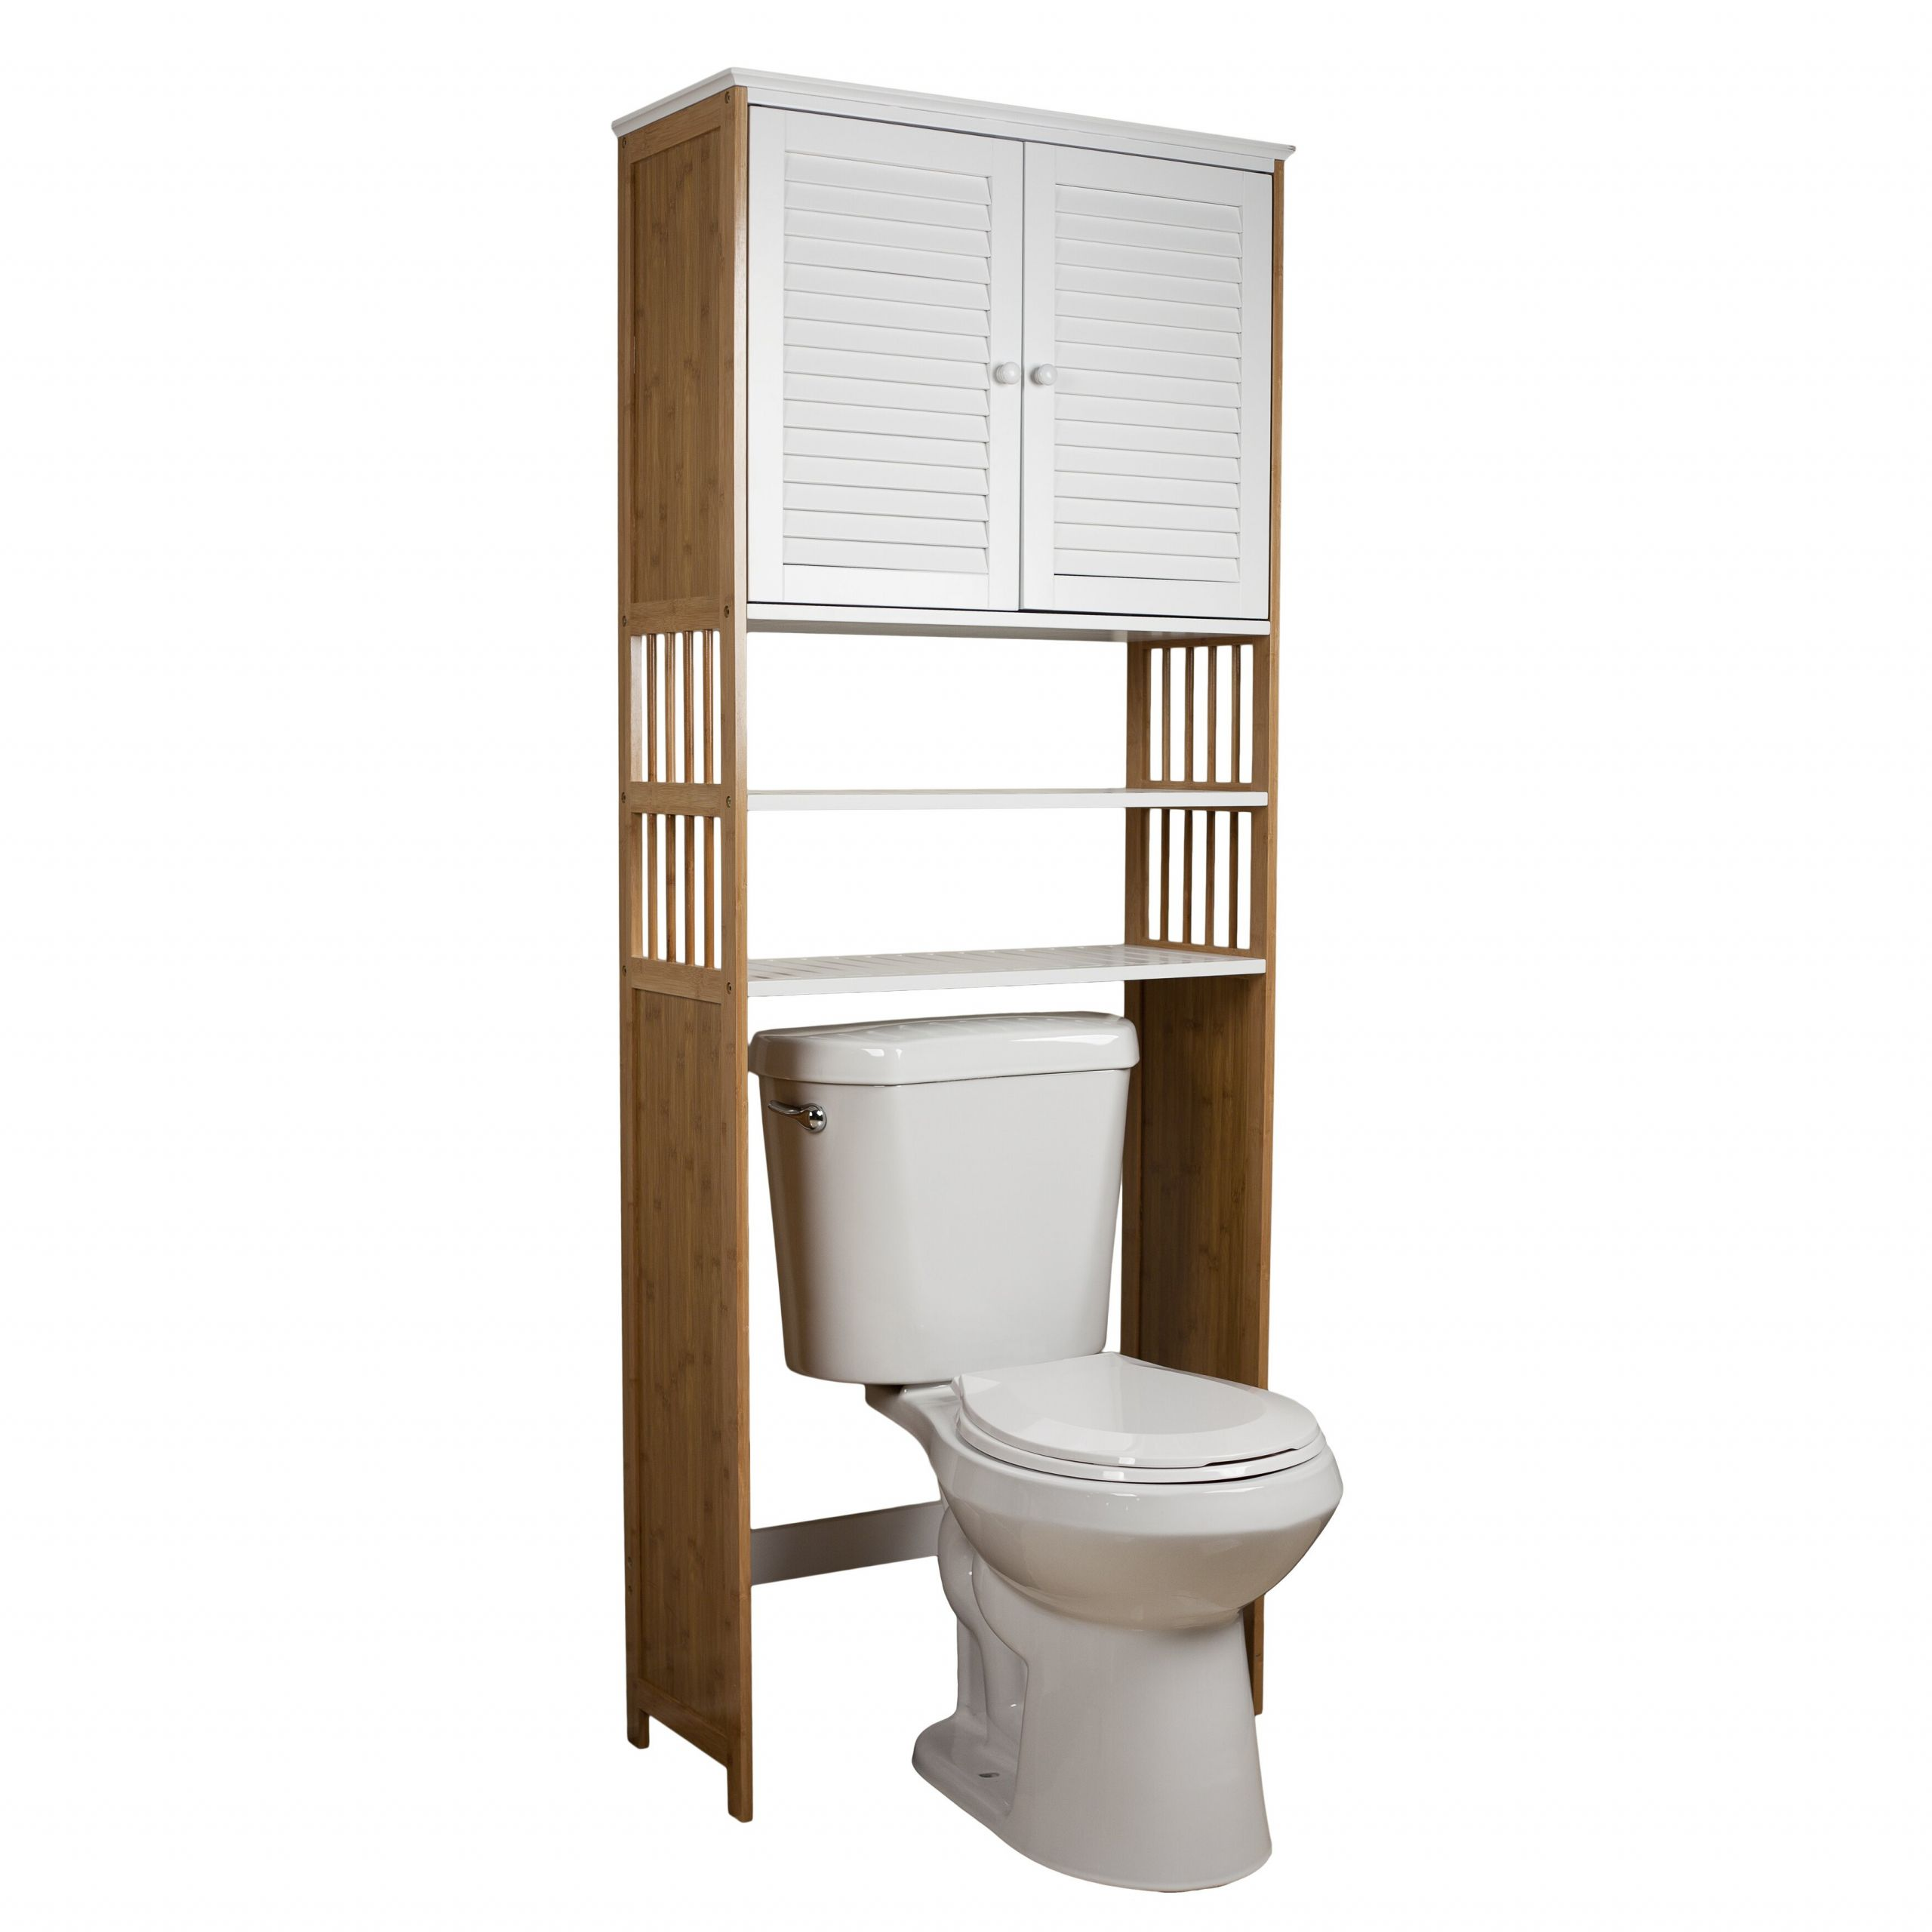 "Over The Toilet Bathroom Cabinets  DanyaB Bamboo Bathroom 27"" x 71"" Over the Toilet Cabinet"